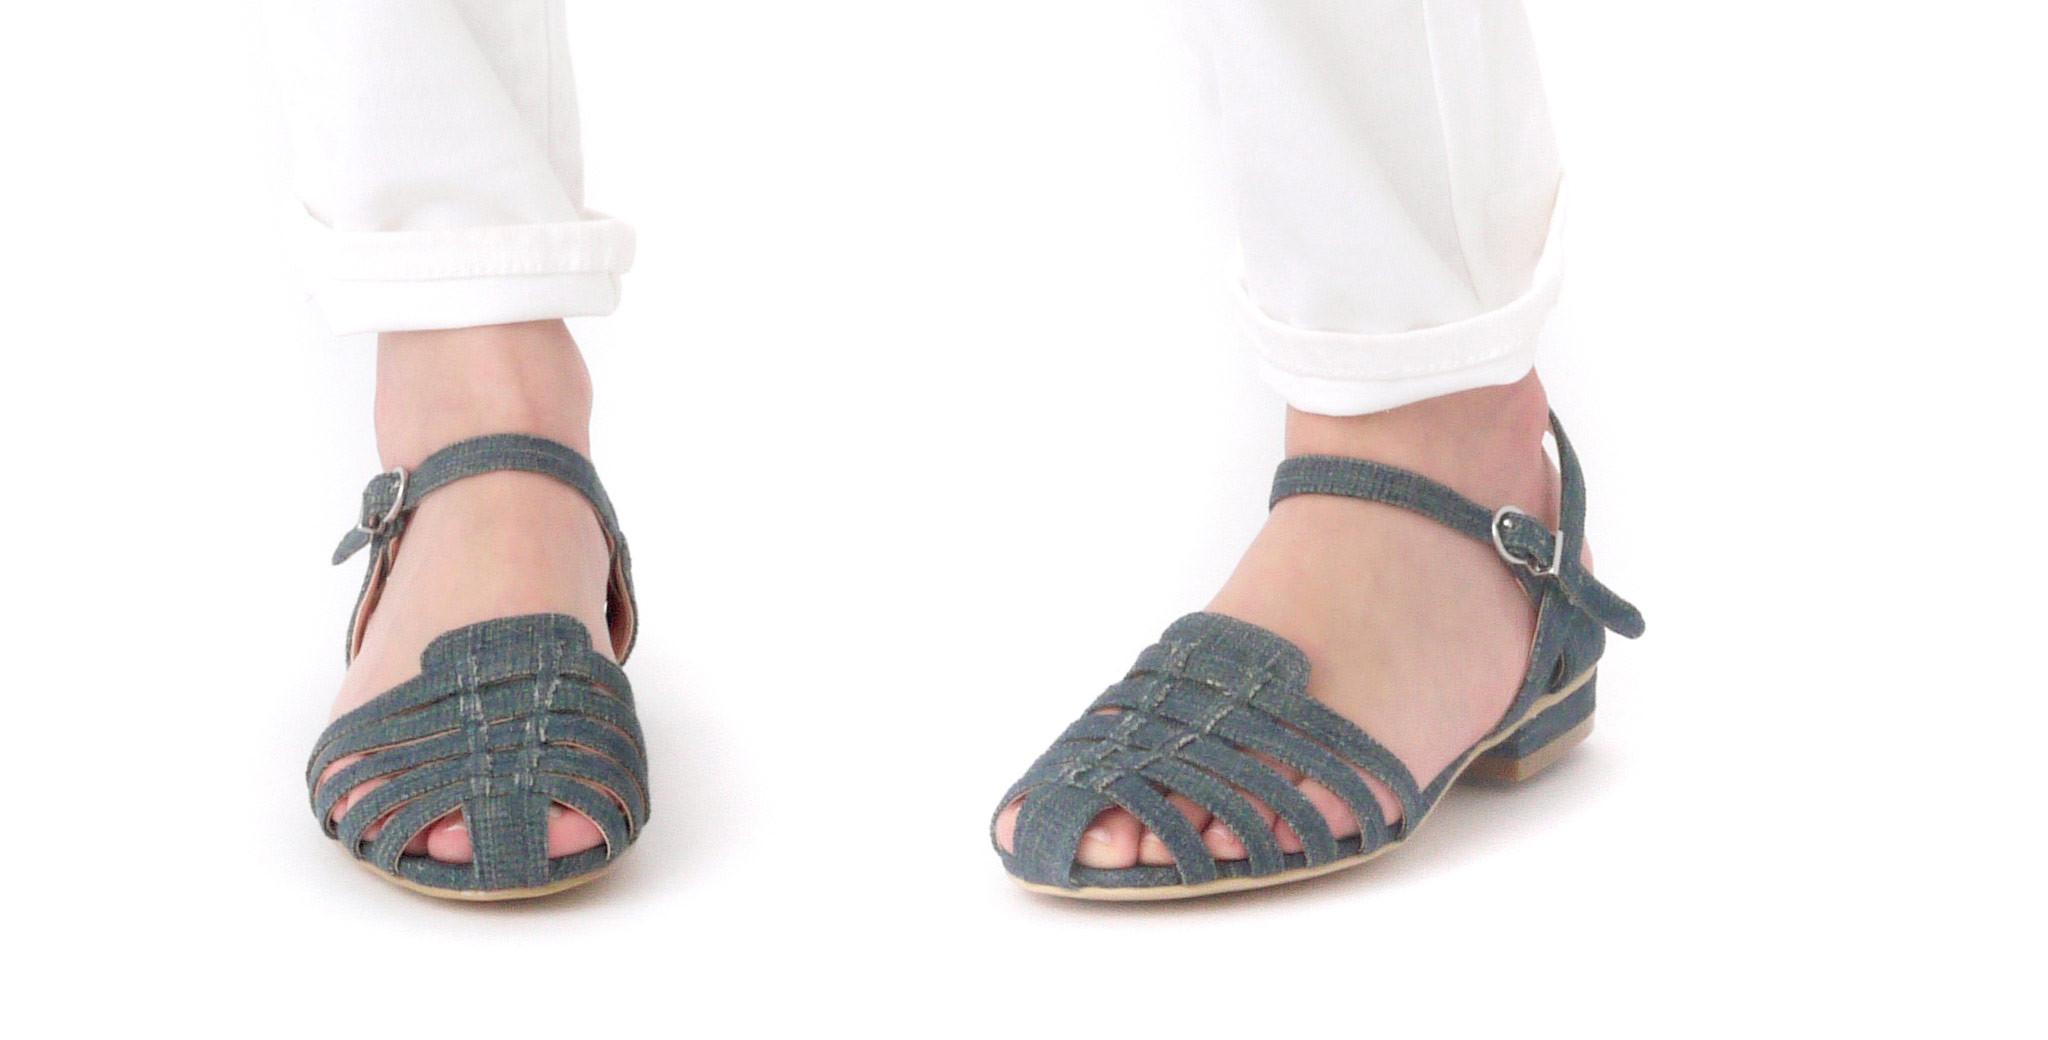 "Marais USA Jelly Sandal in Denim, <a href=""http://www.maraisusa.com/products/jelly-sandal-denim#.VXn9q1xViko"" target=""_blank"">$98</a>"